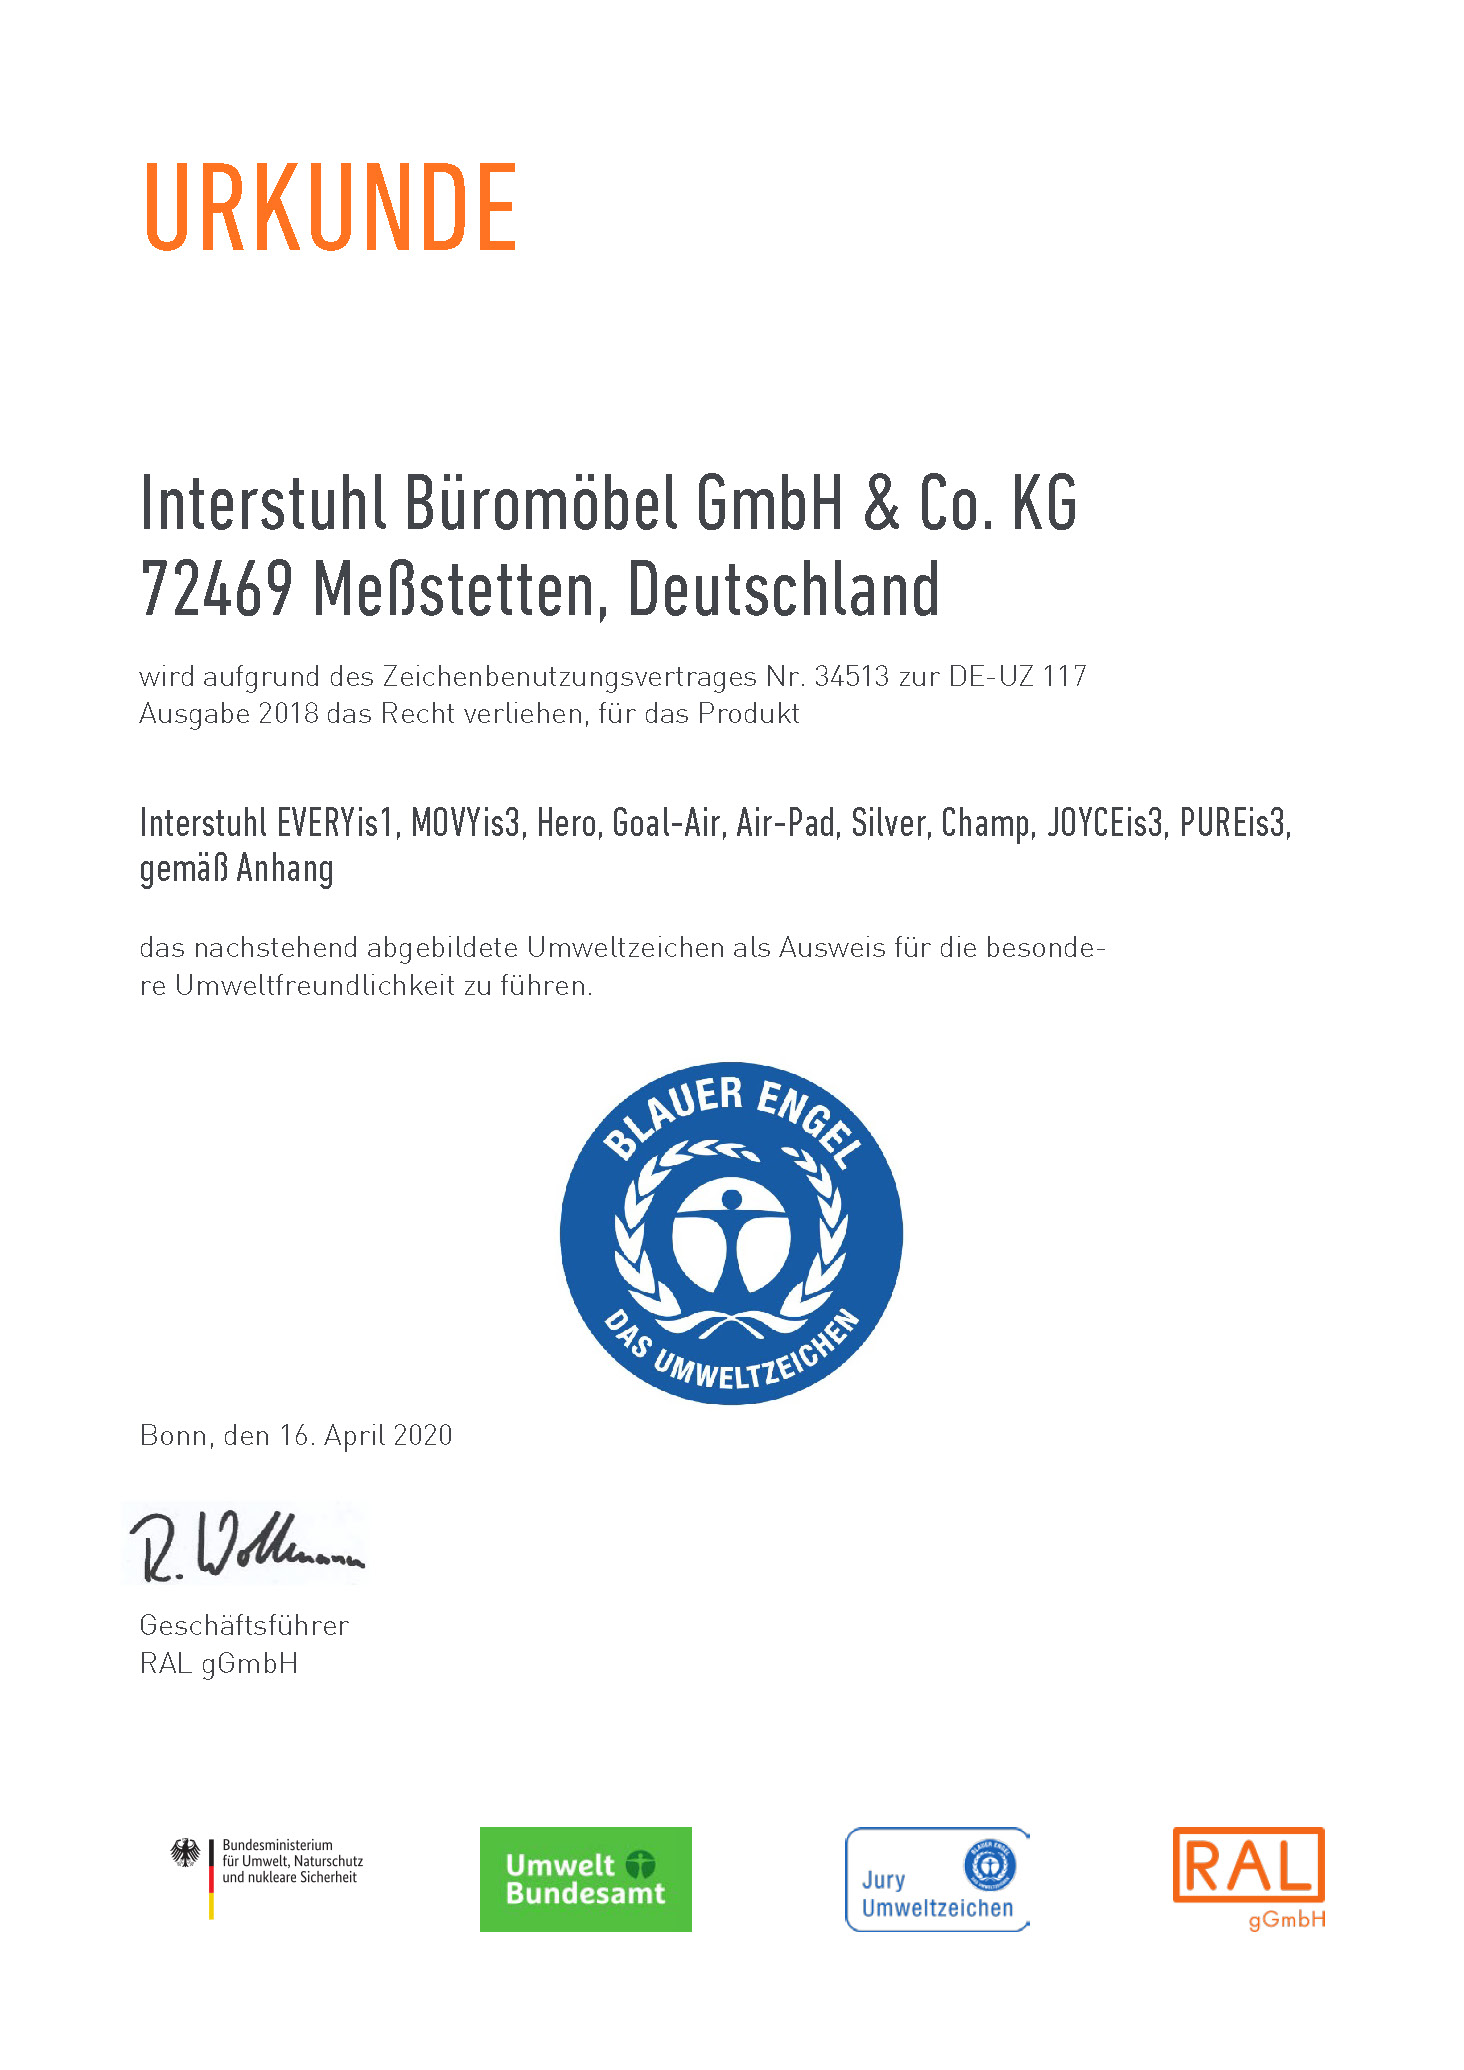 Interstuhl airpad - Interstuhl jobs ...